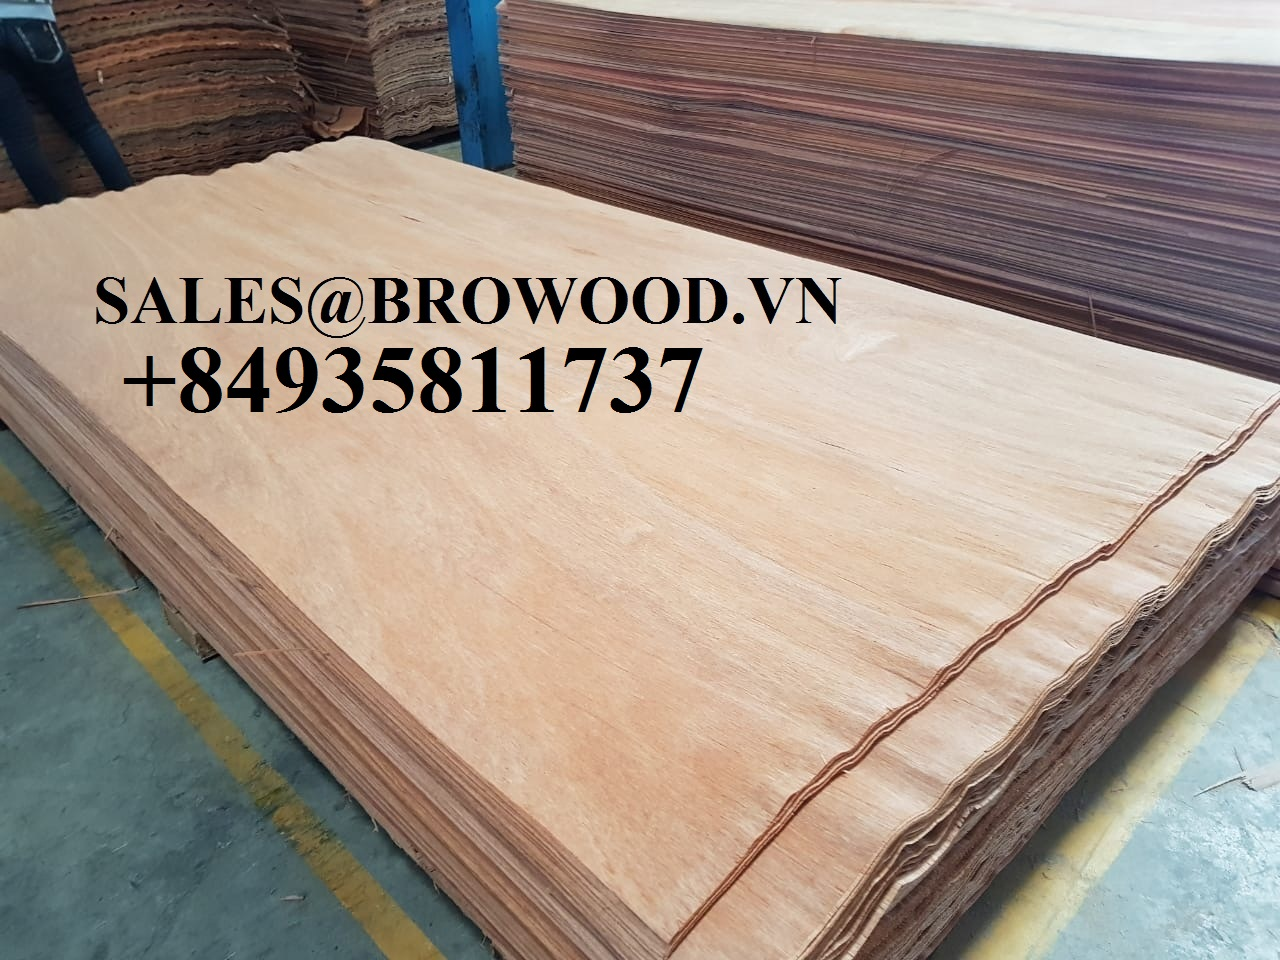 sellling eucalyptus core veneer from viet nam